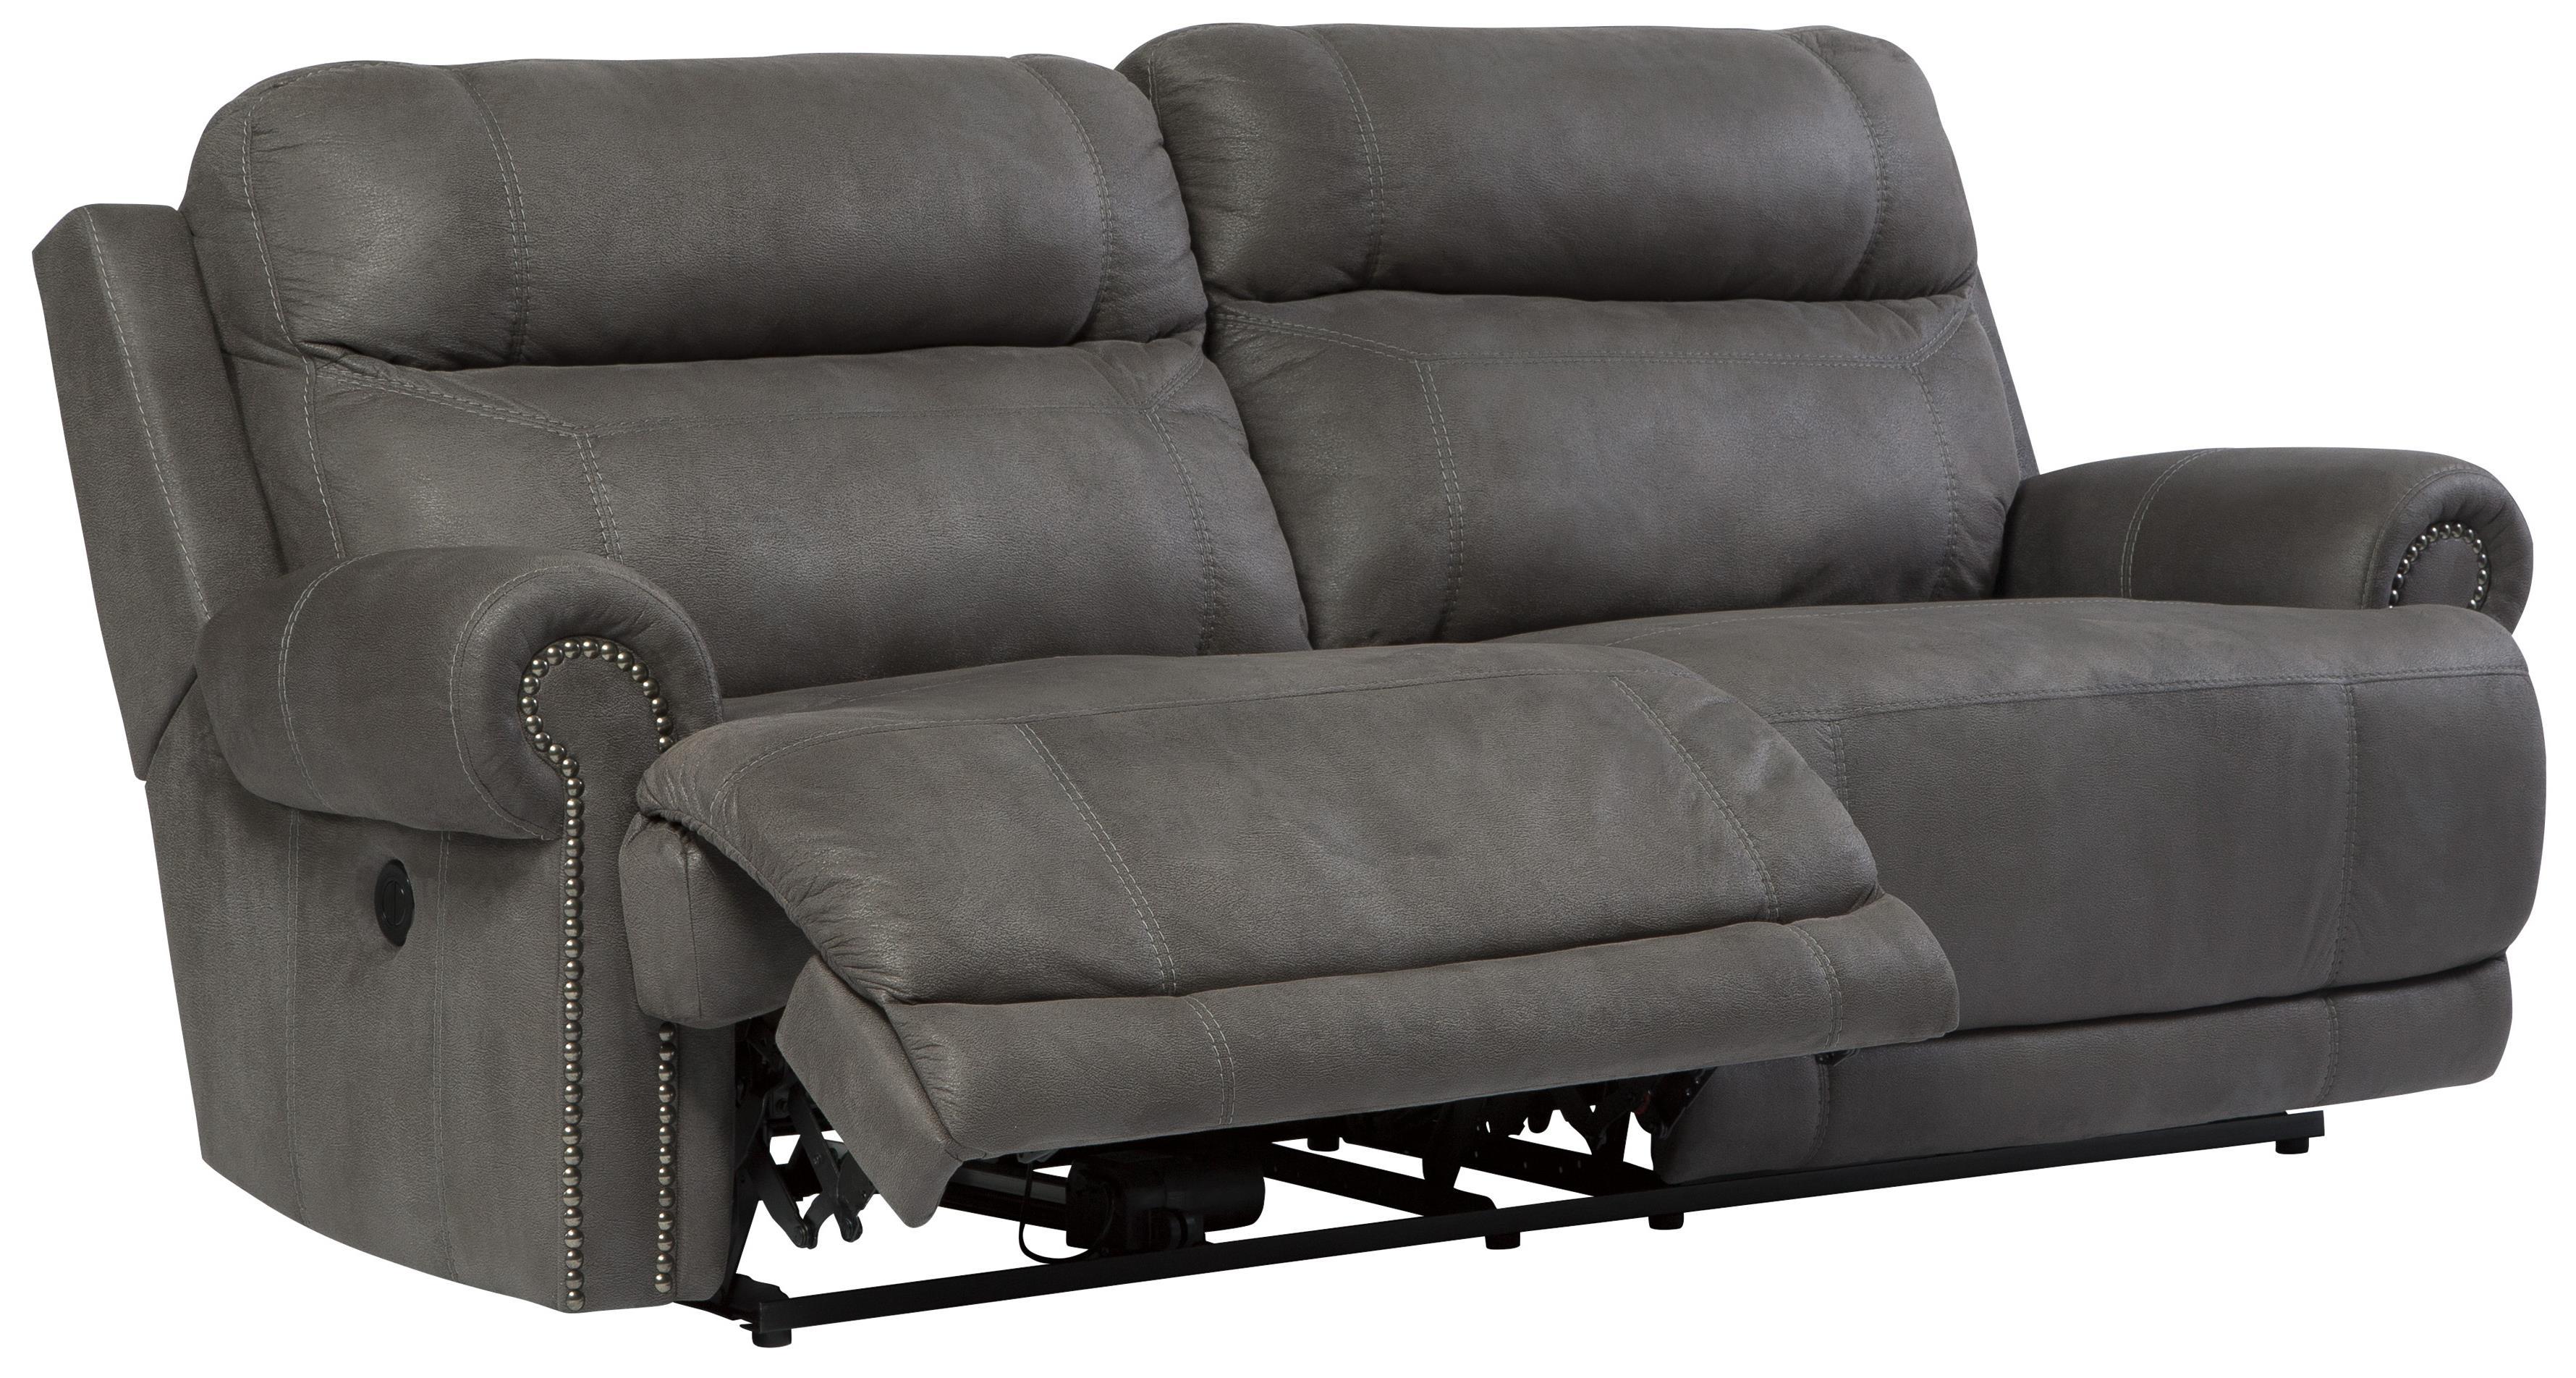 grey carleton nailhead sofa corner leather sofas cheap signature design by ashley austere gray 3840181 2 seat